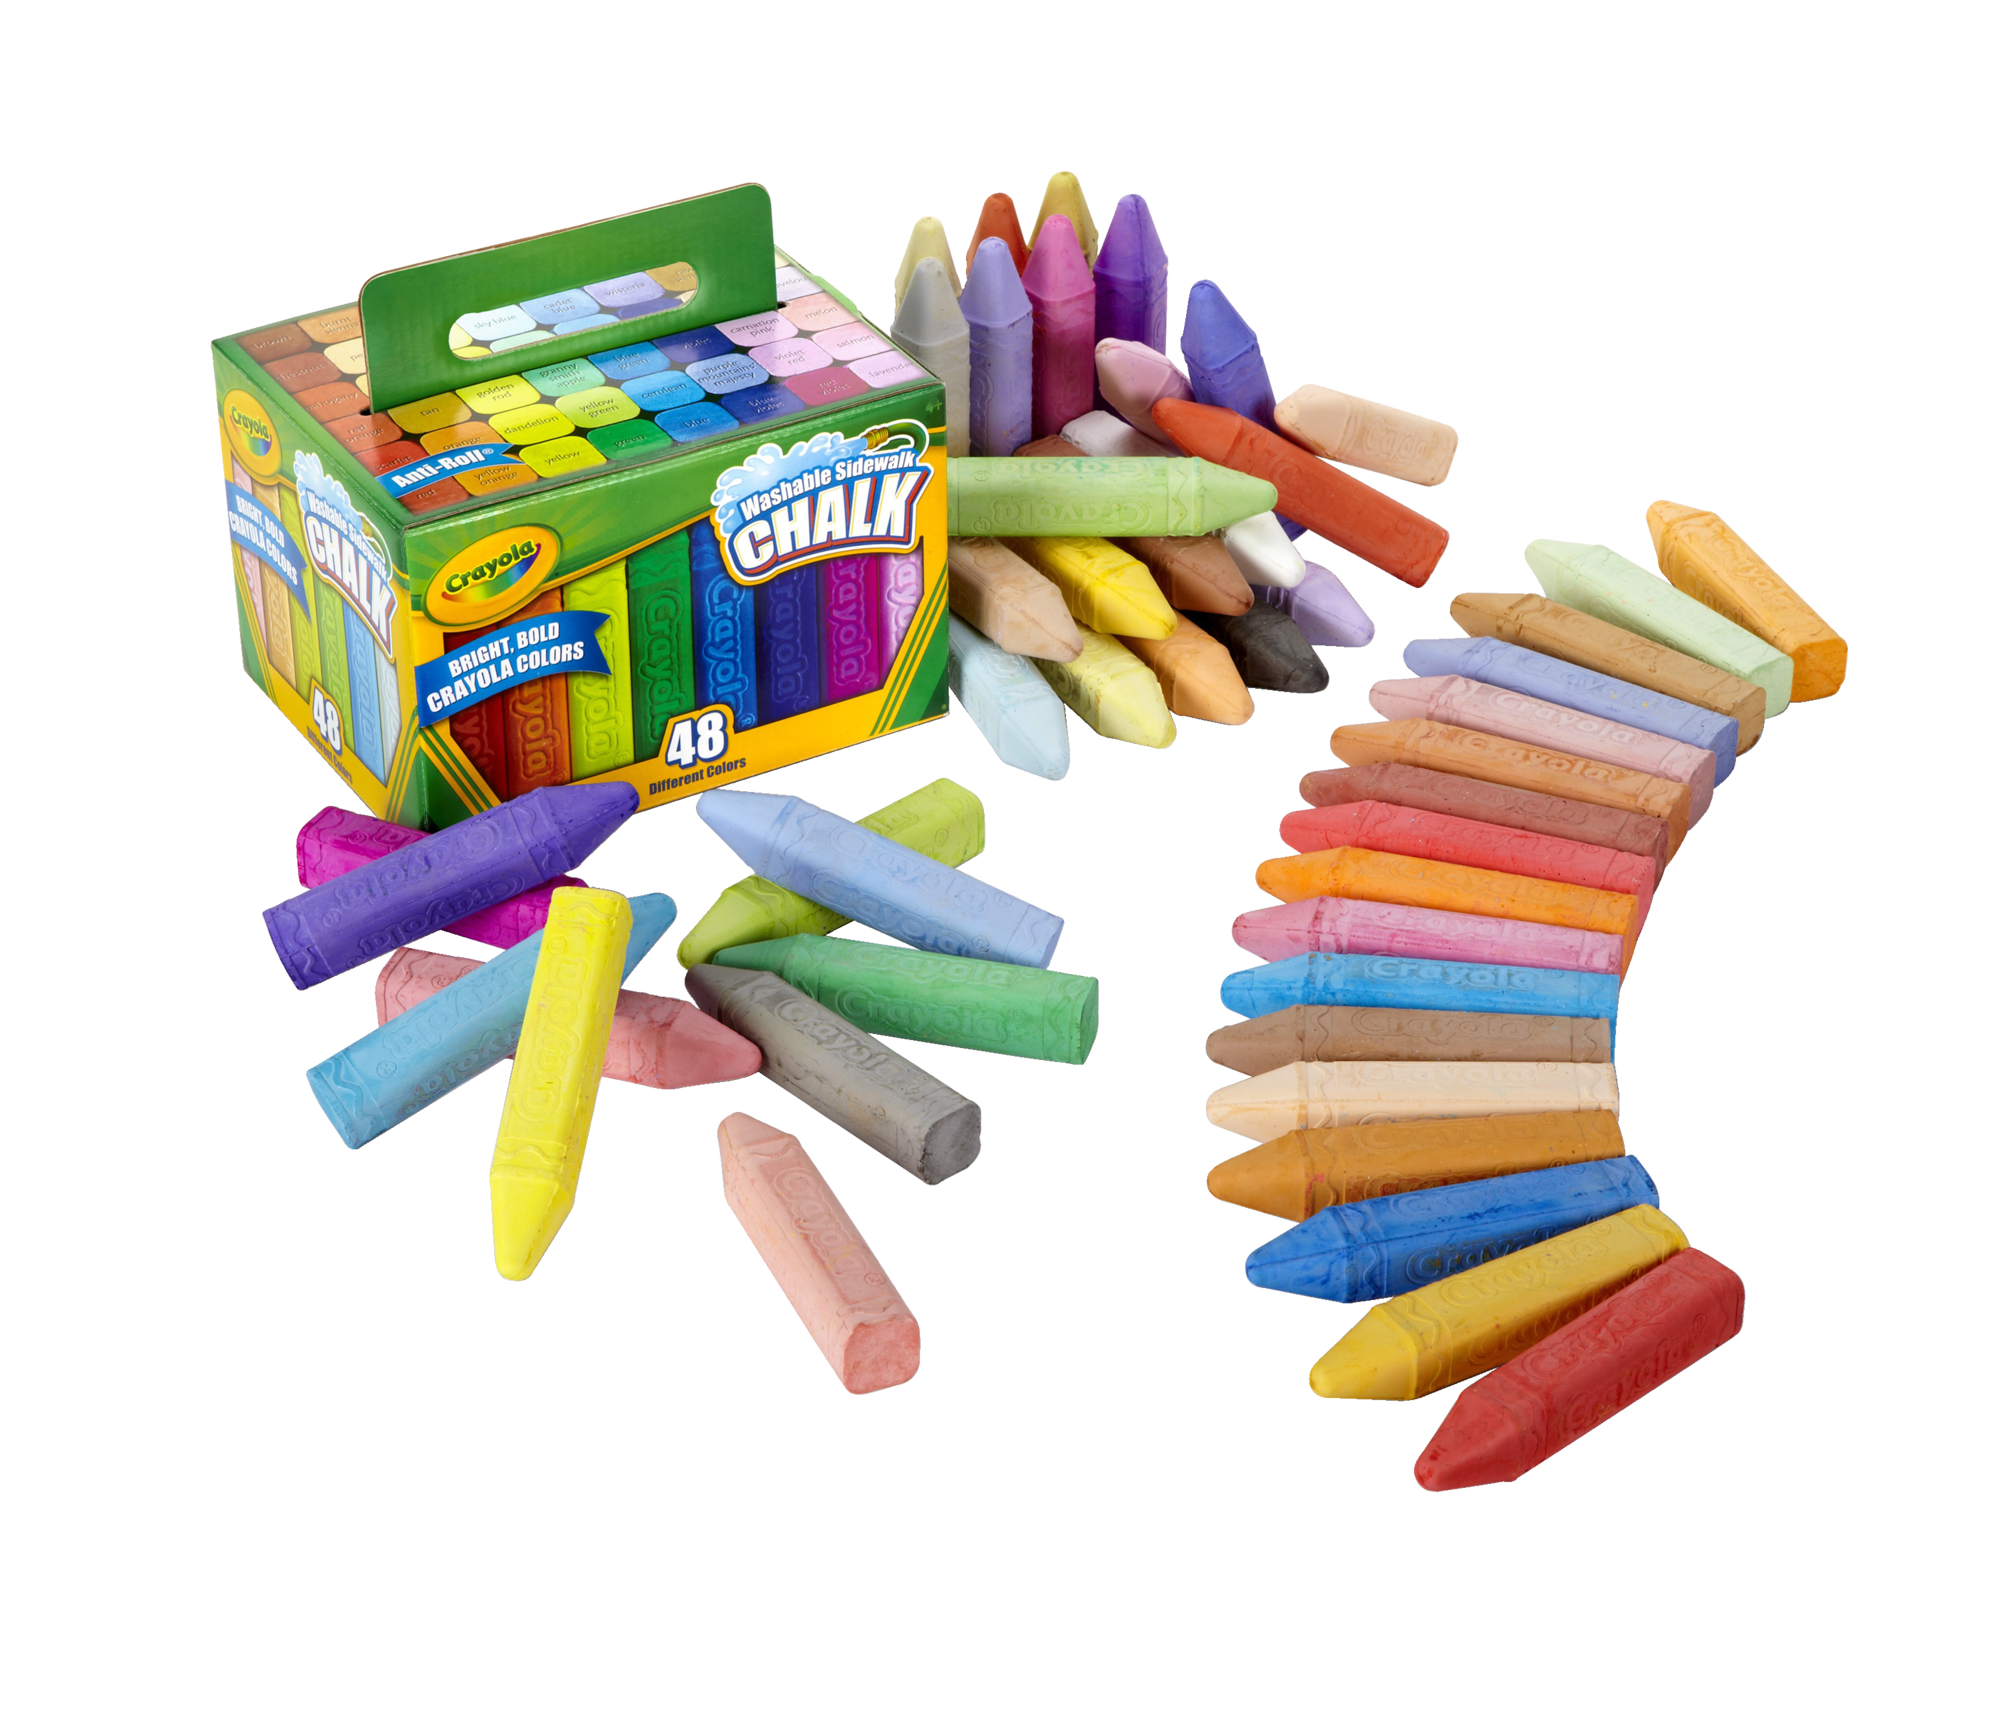 Crayola 48 Count Washable Sidewalk Chalk in Assorted Colors by Crayola LLC